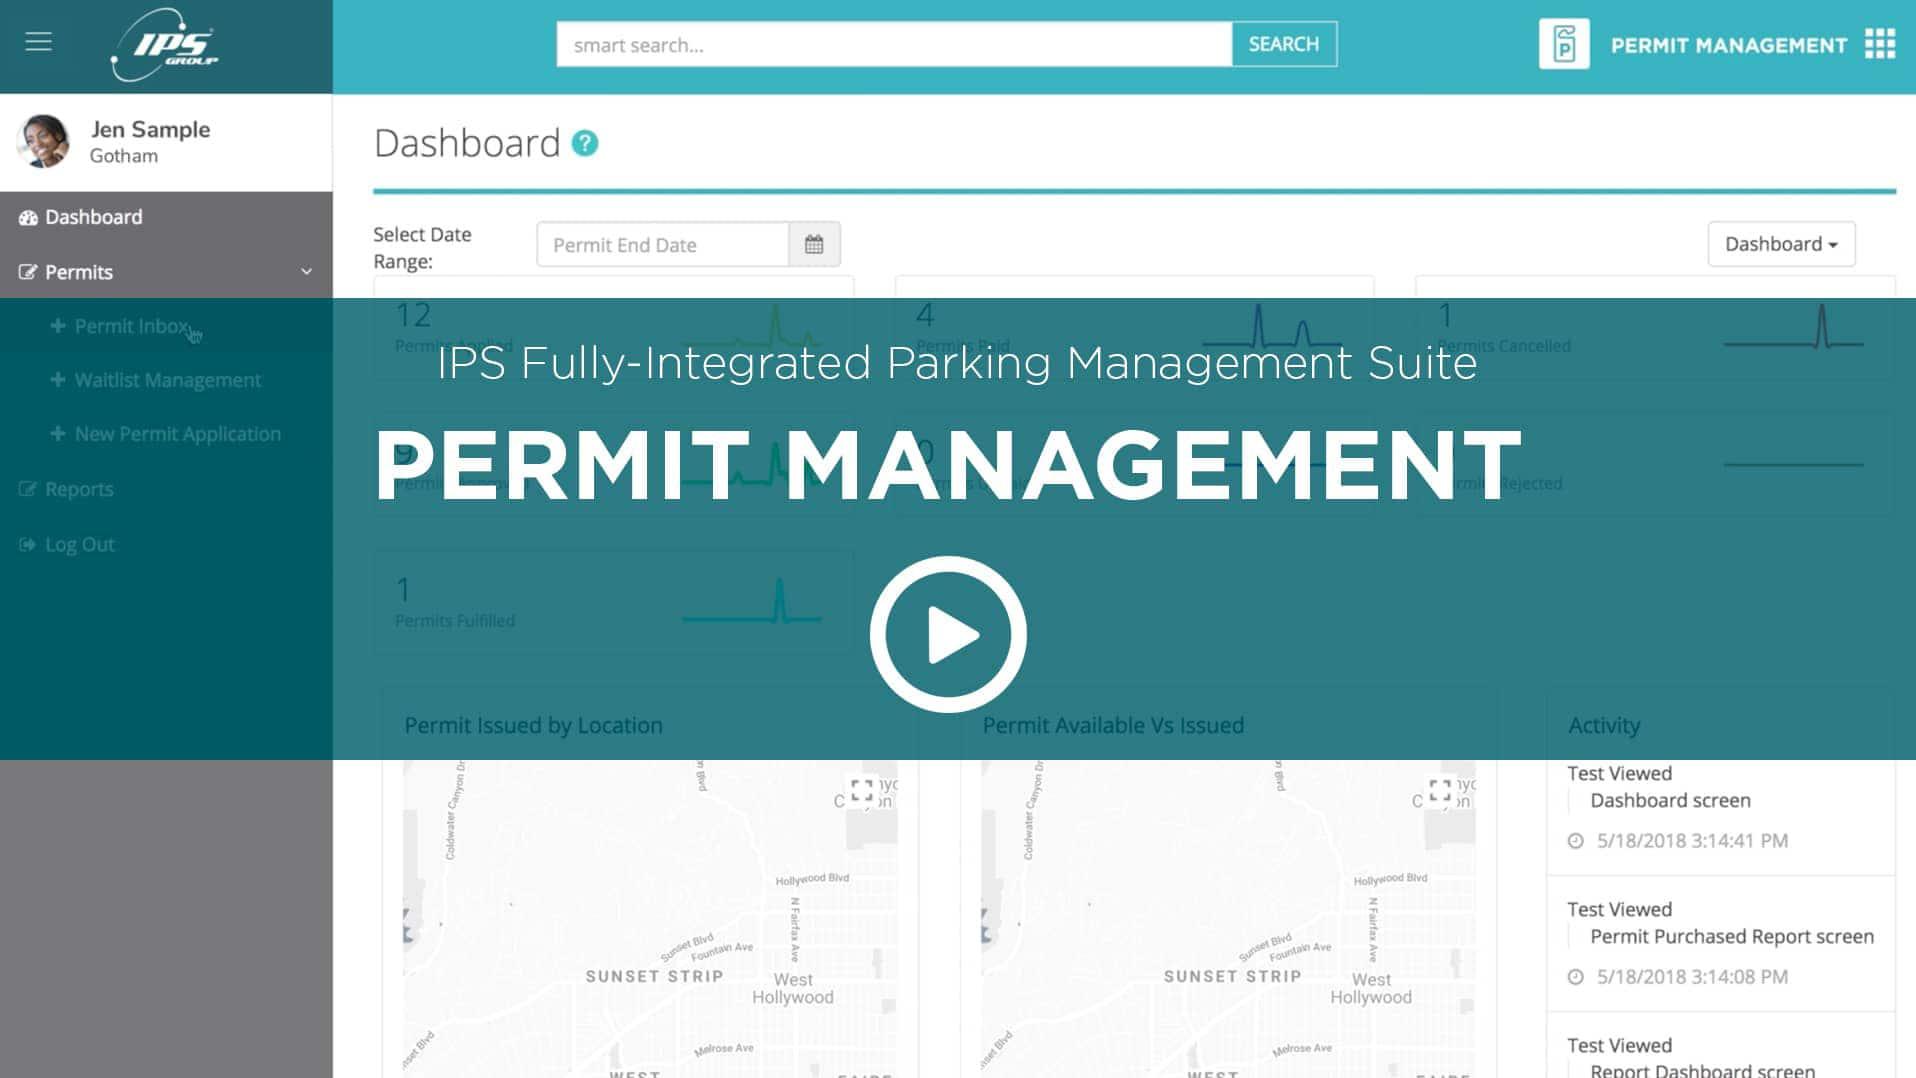 Permit Management Video